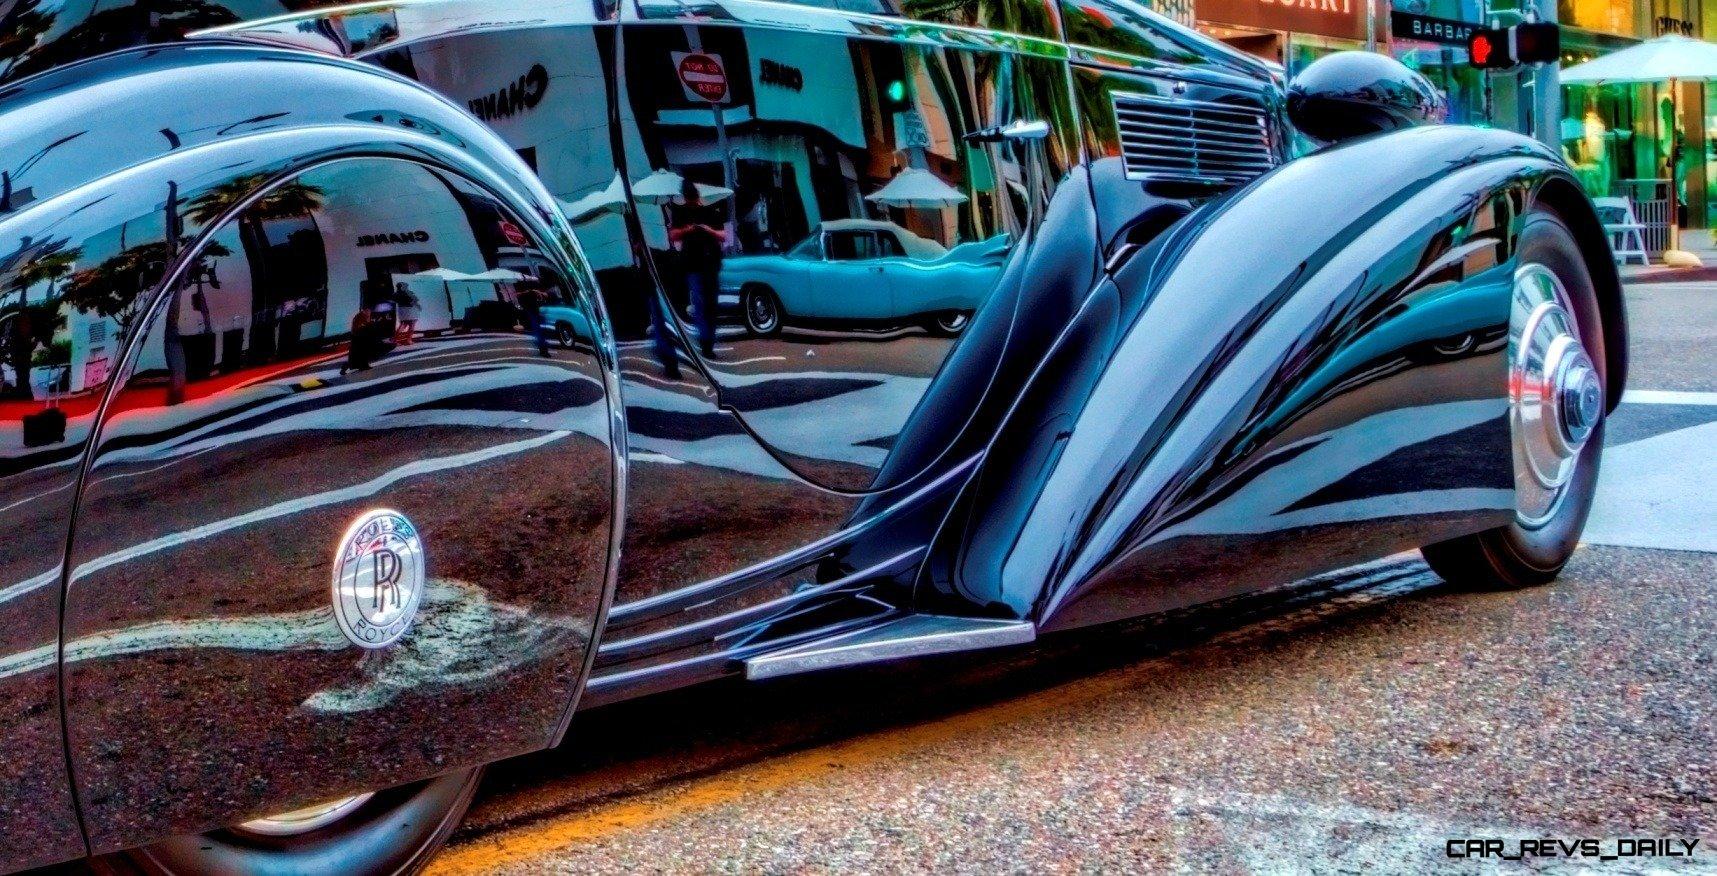 Iconic Classic - 1925/34 Rolls-Royce Phantom I - Round ...